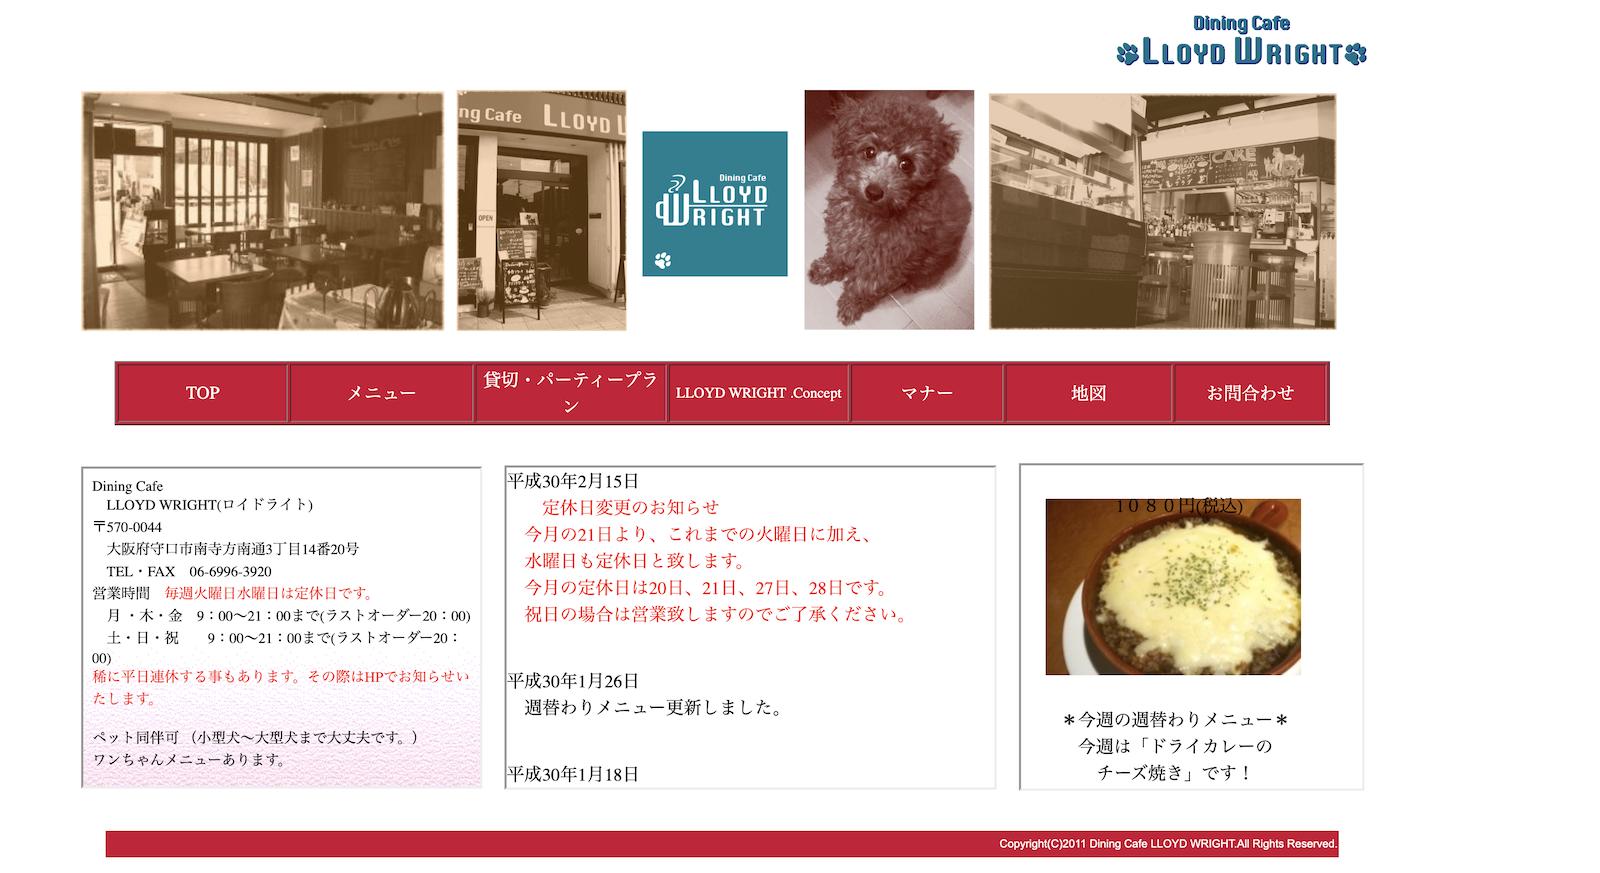 Dining Cafe Lloyd wright (ダイニングカフェロイドライト)